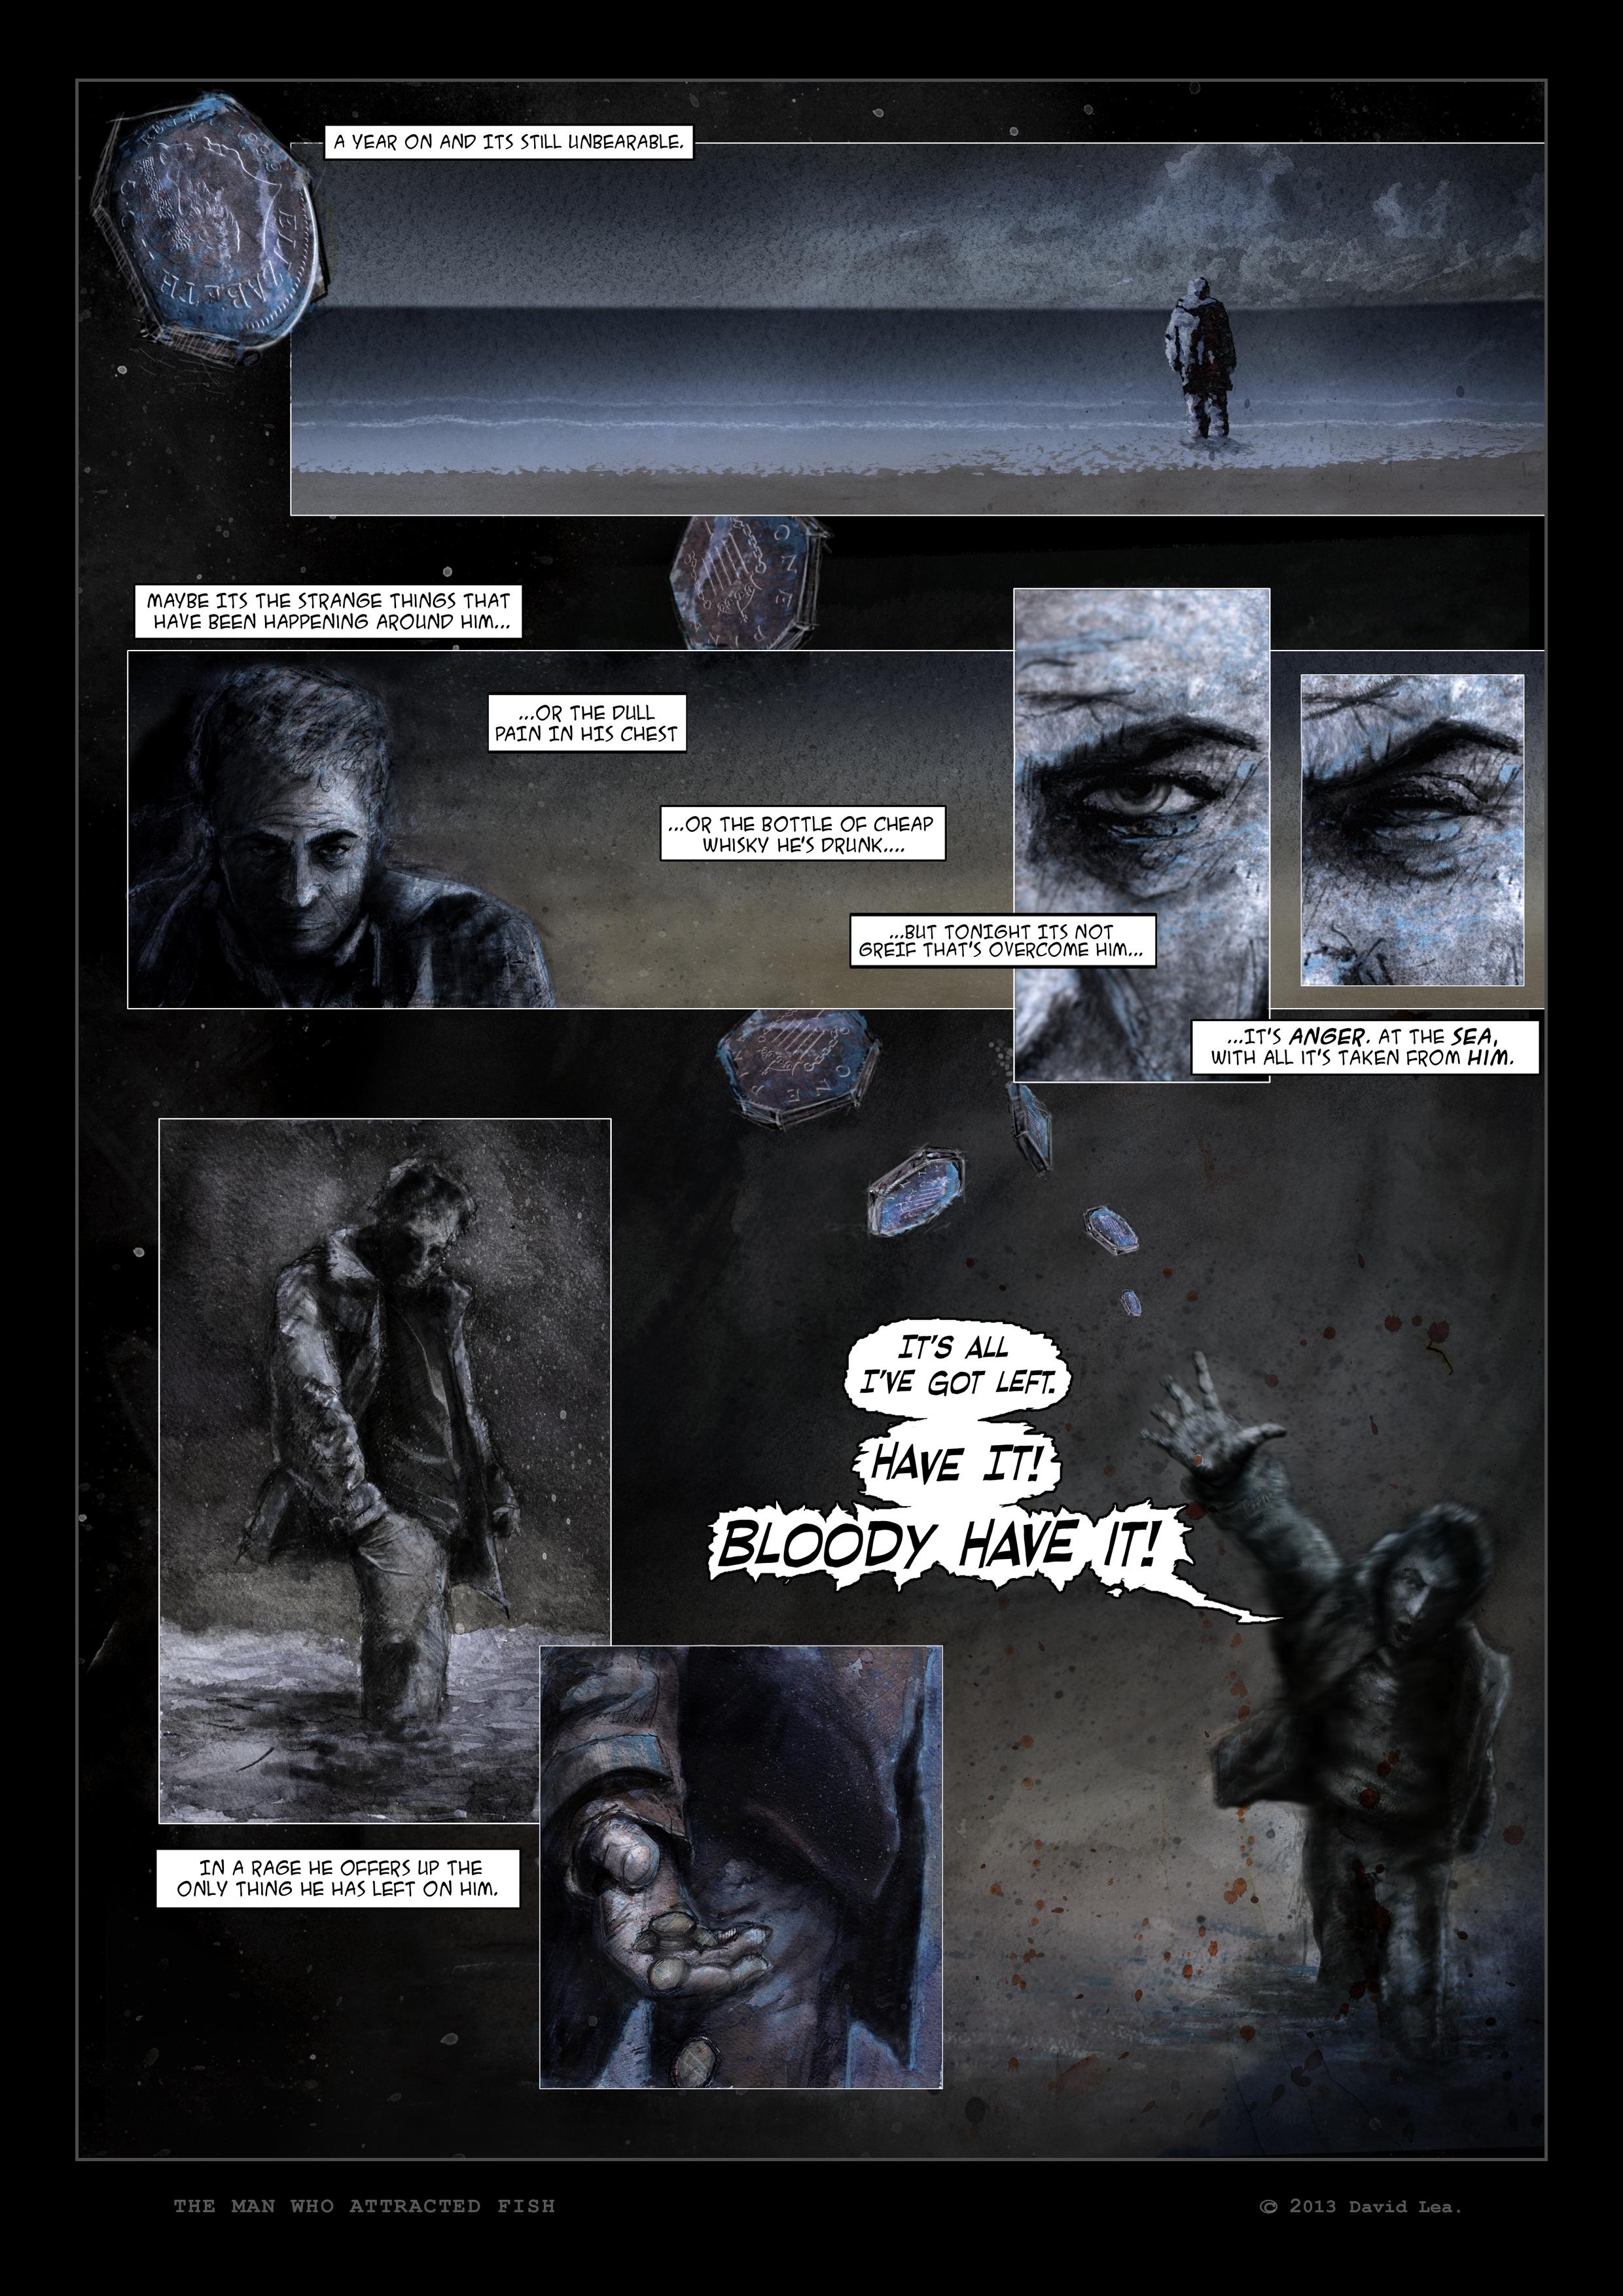 TMWAF_Graphic novel scene - page 2